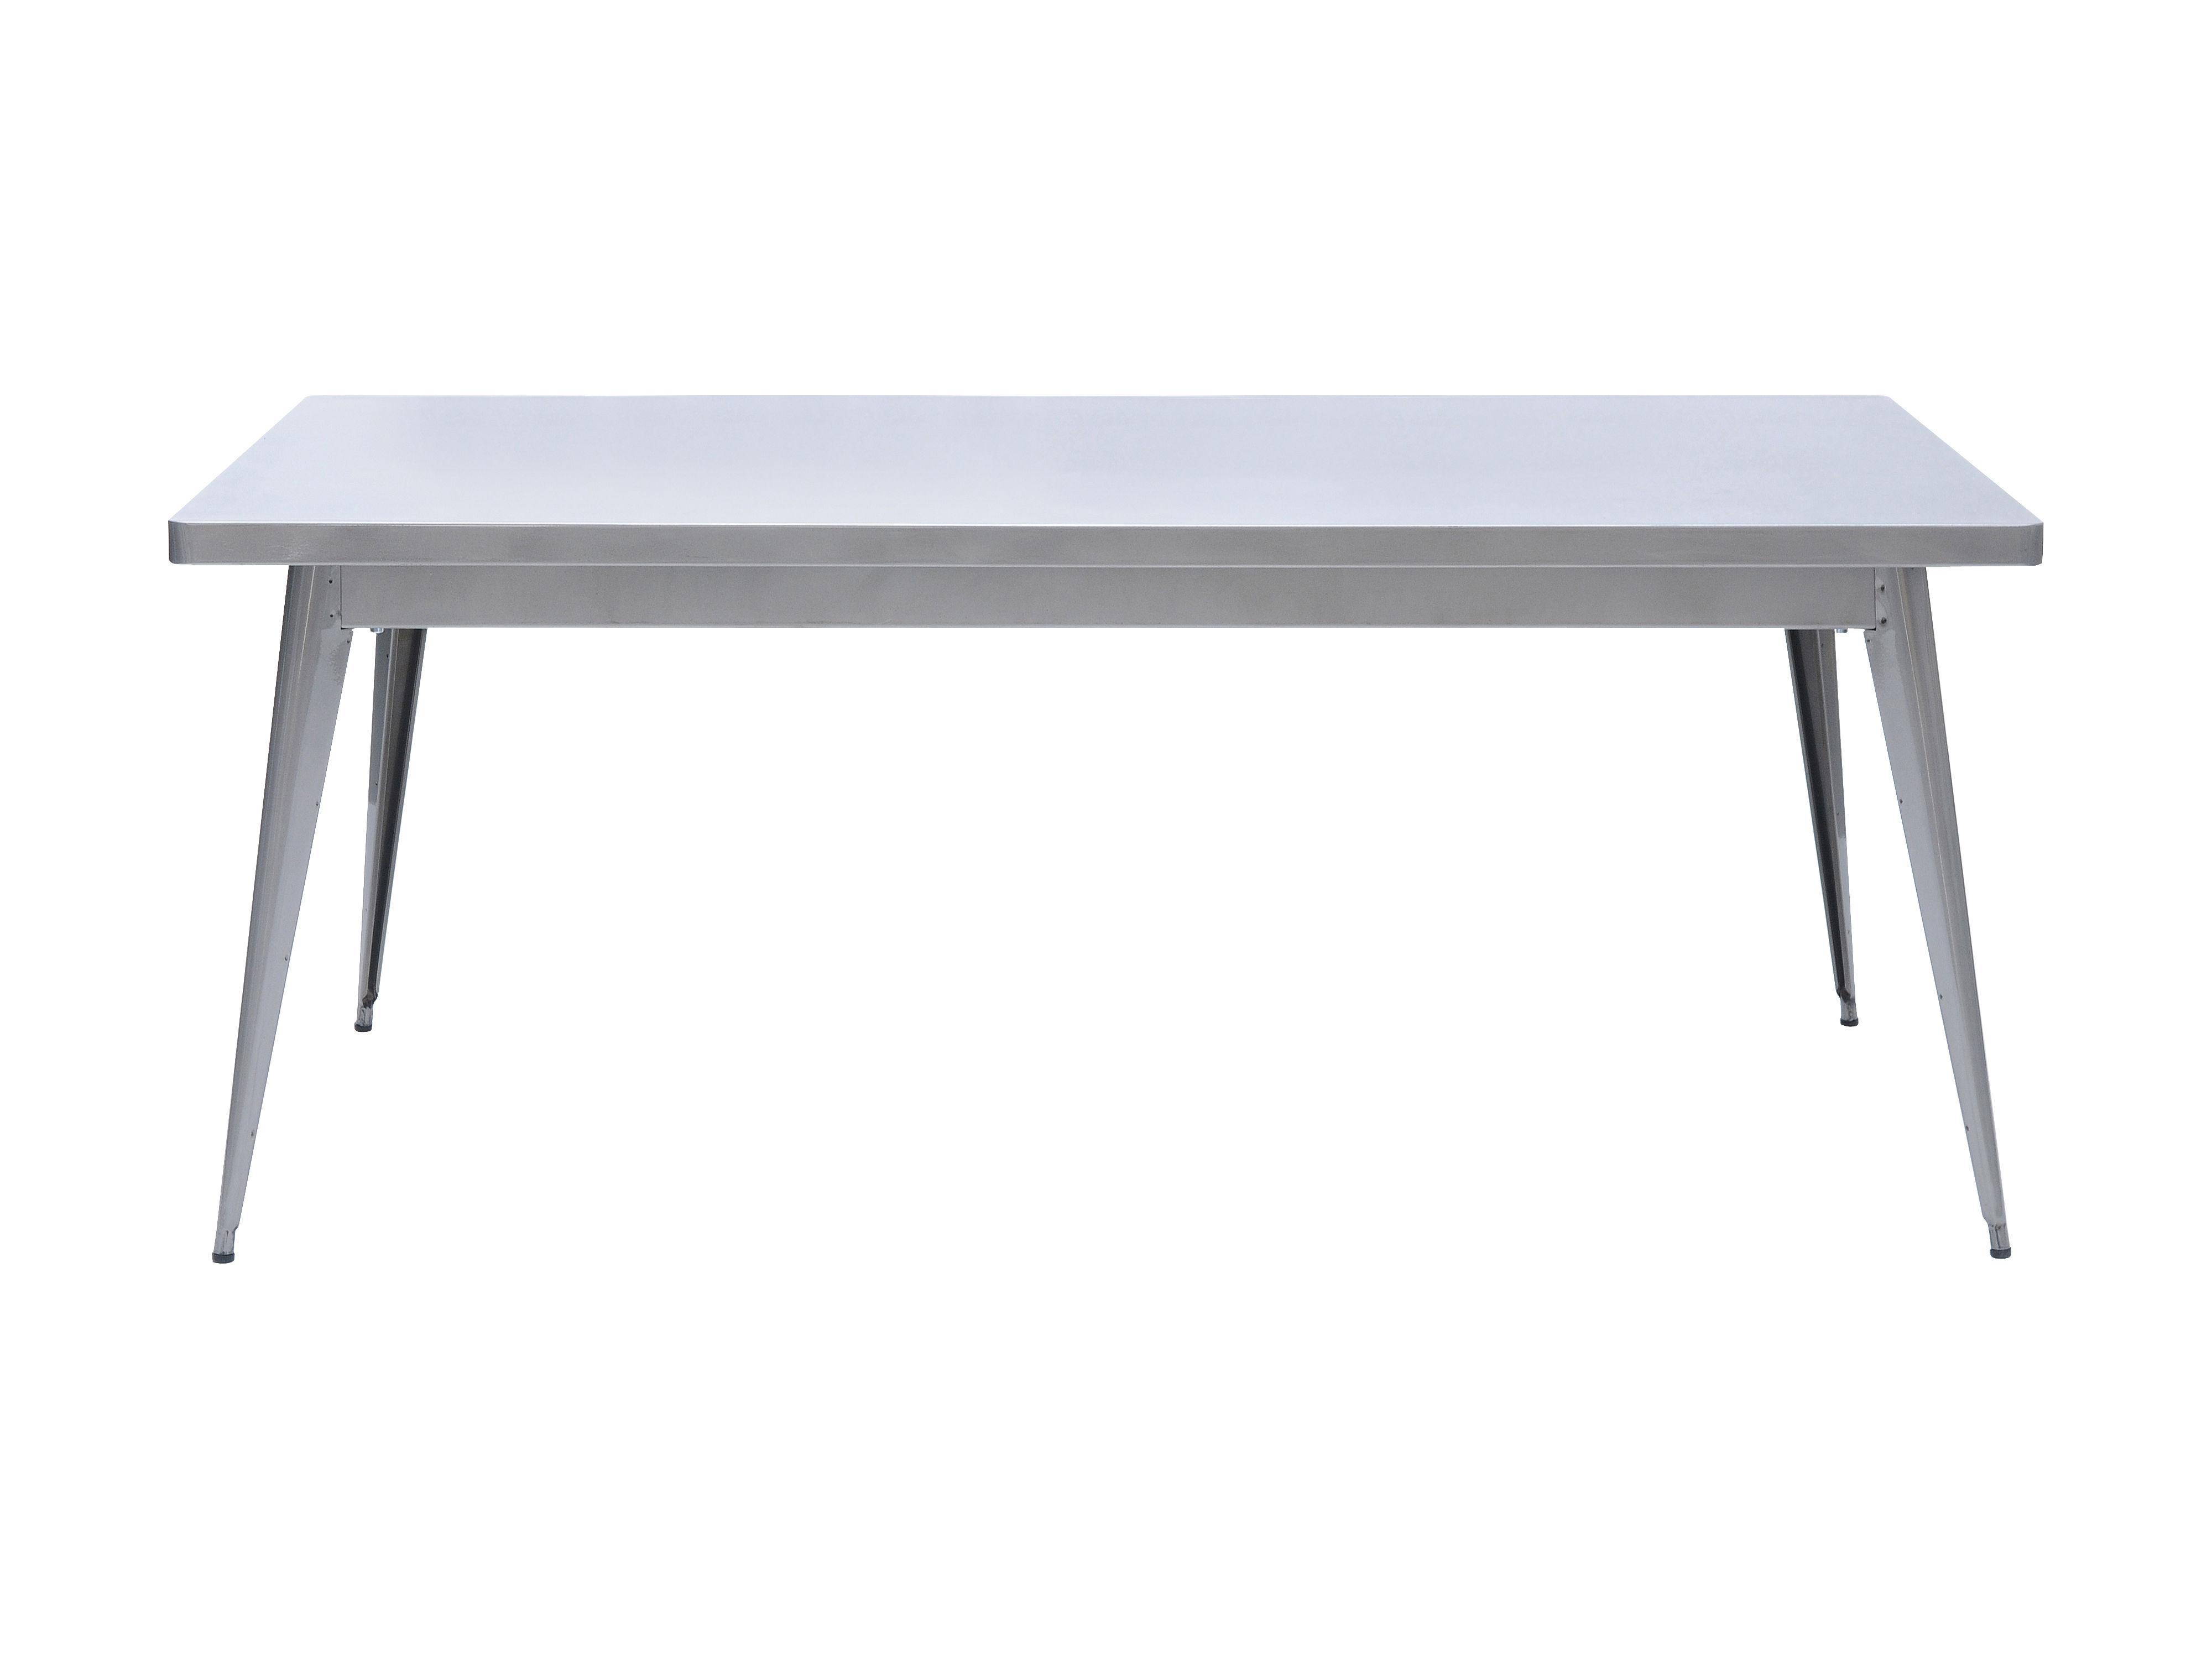 Scopri tavolo 55 l 130 x larg 70 cm 130 x 70 cm for Tavolo 70 x 120